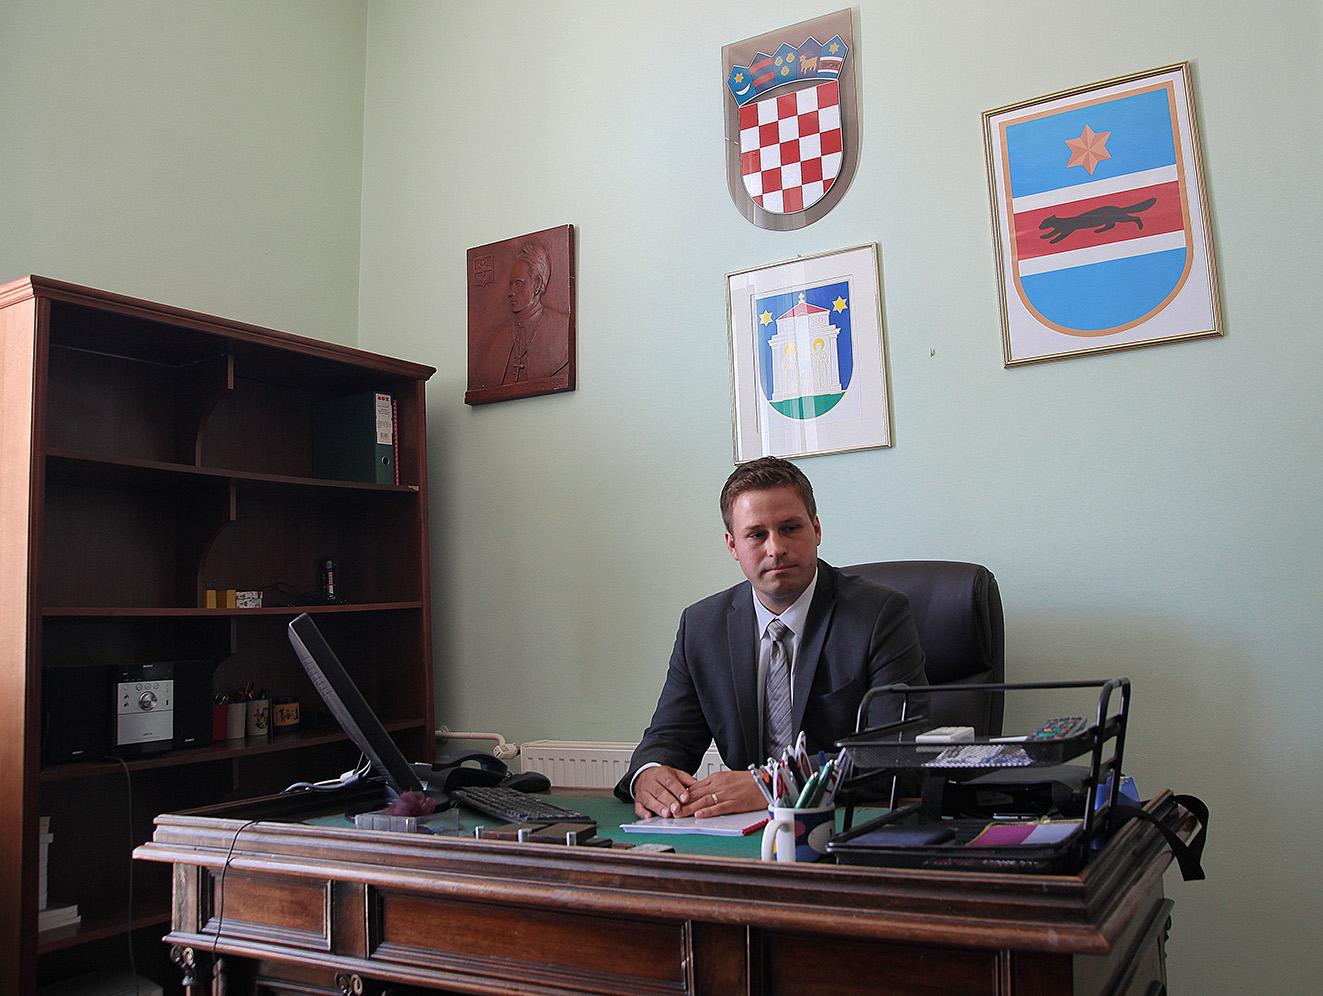 MARIN MANDARIĆ PREUZEO DUŽNOST GRADONAČELNIKA ĐAKOVA